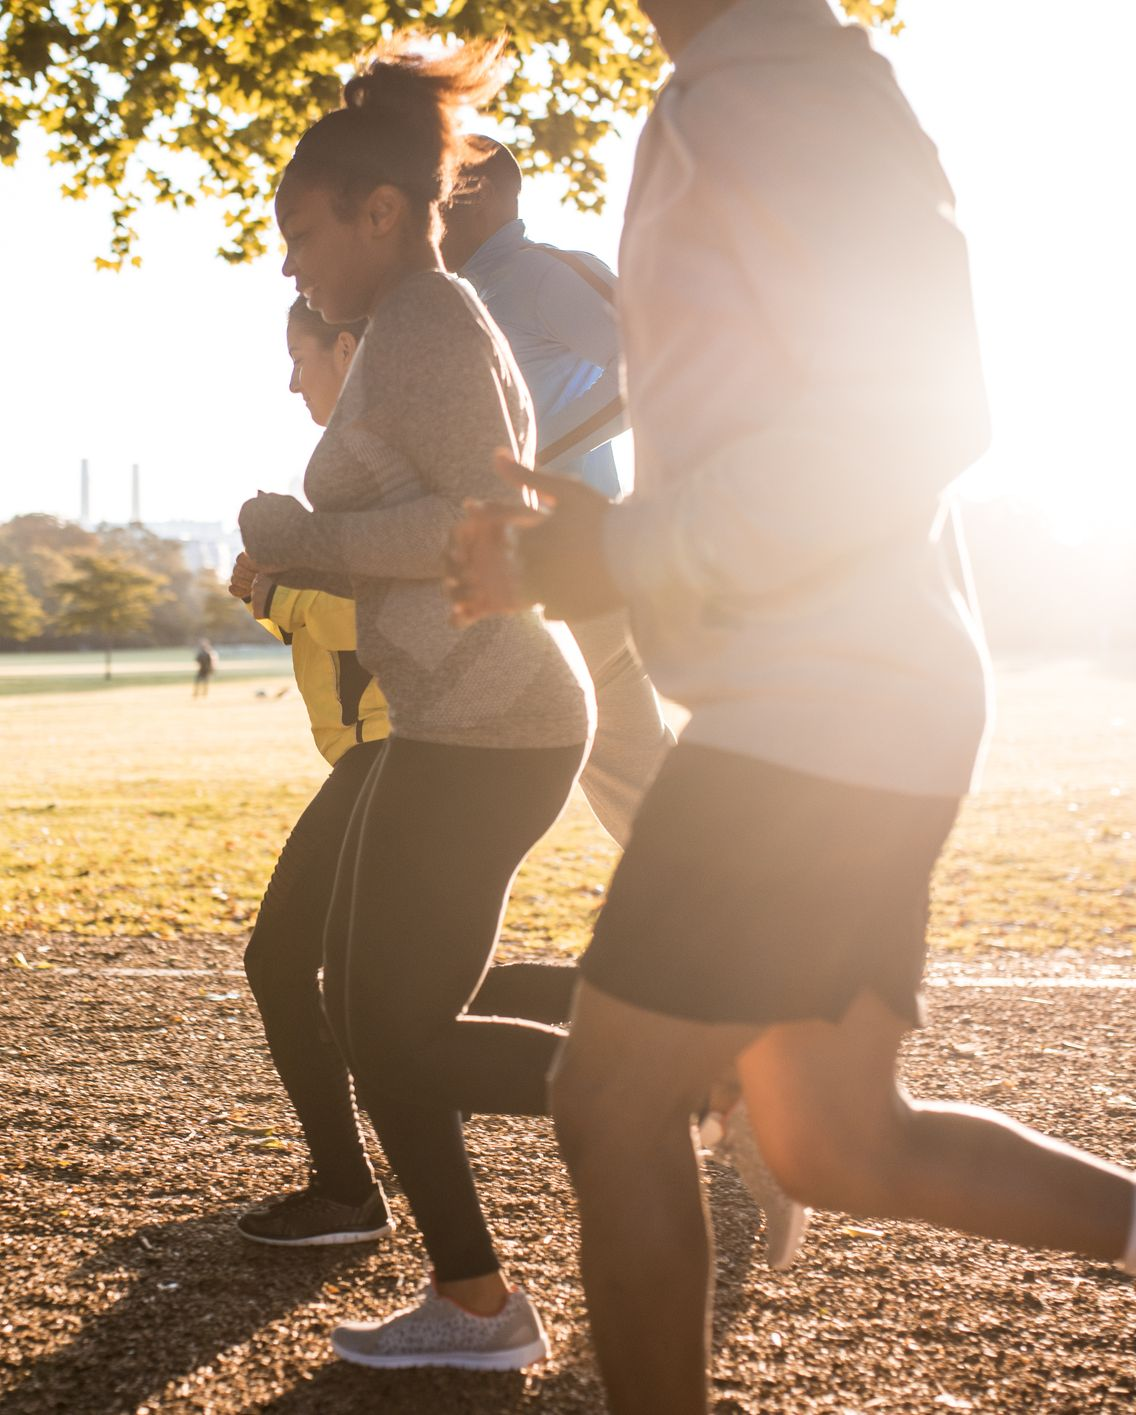 It's great to run when sun is shining